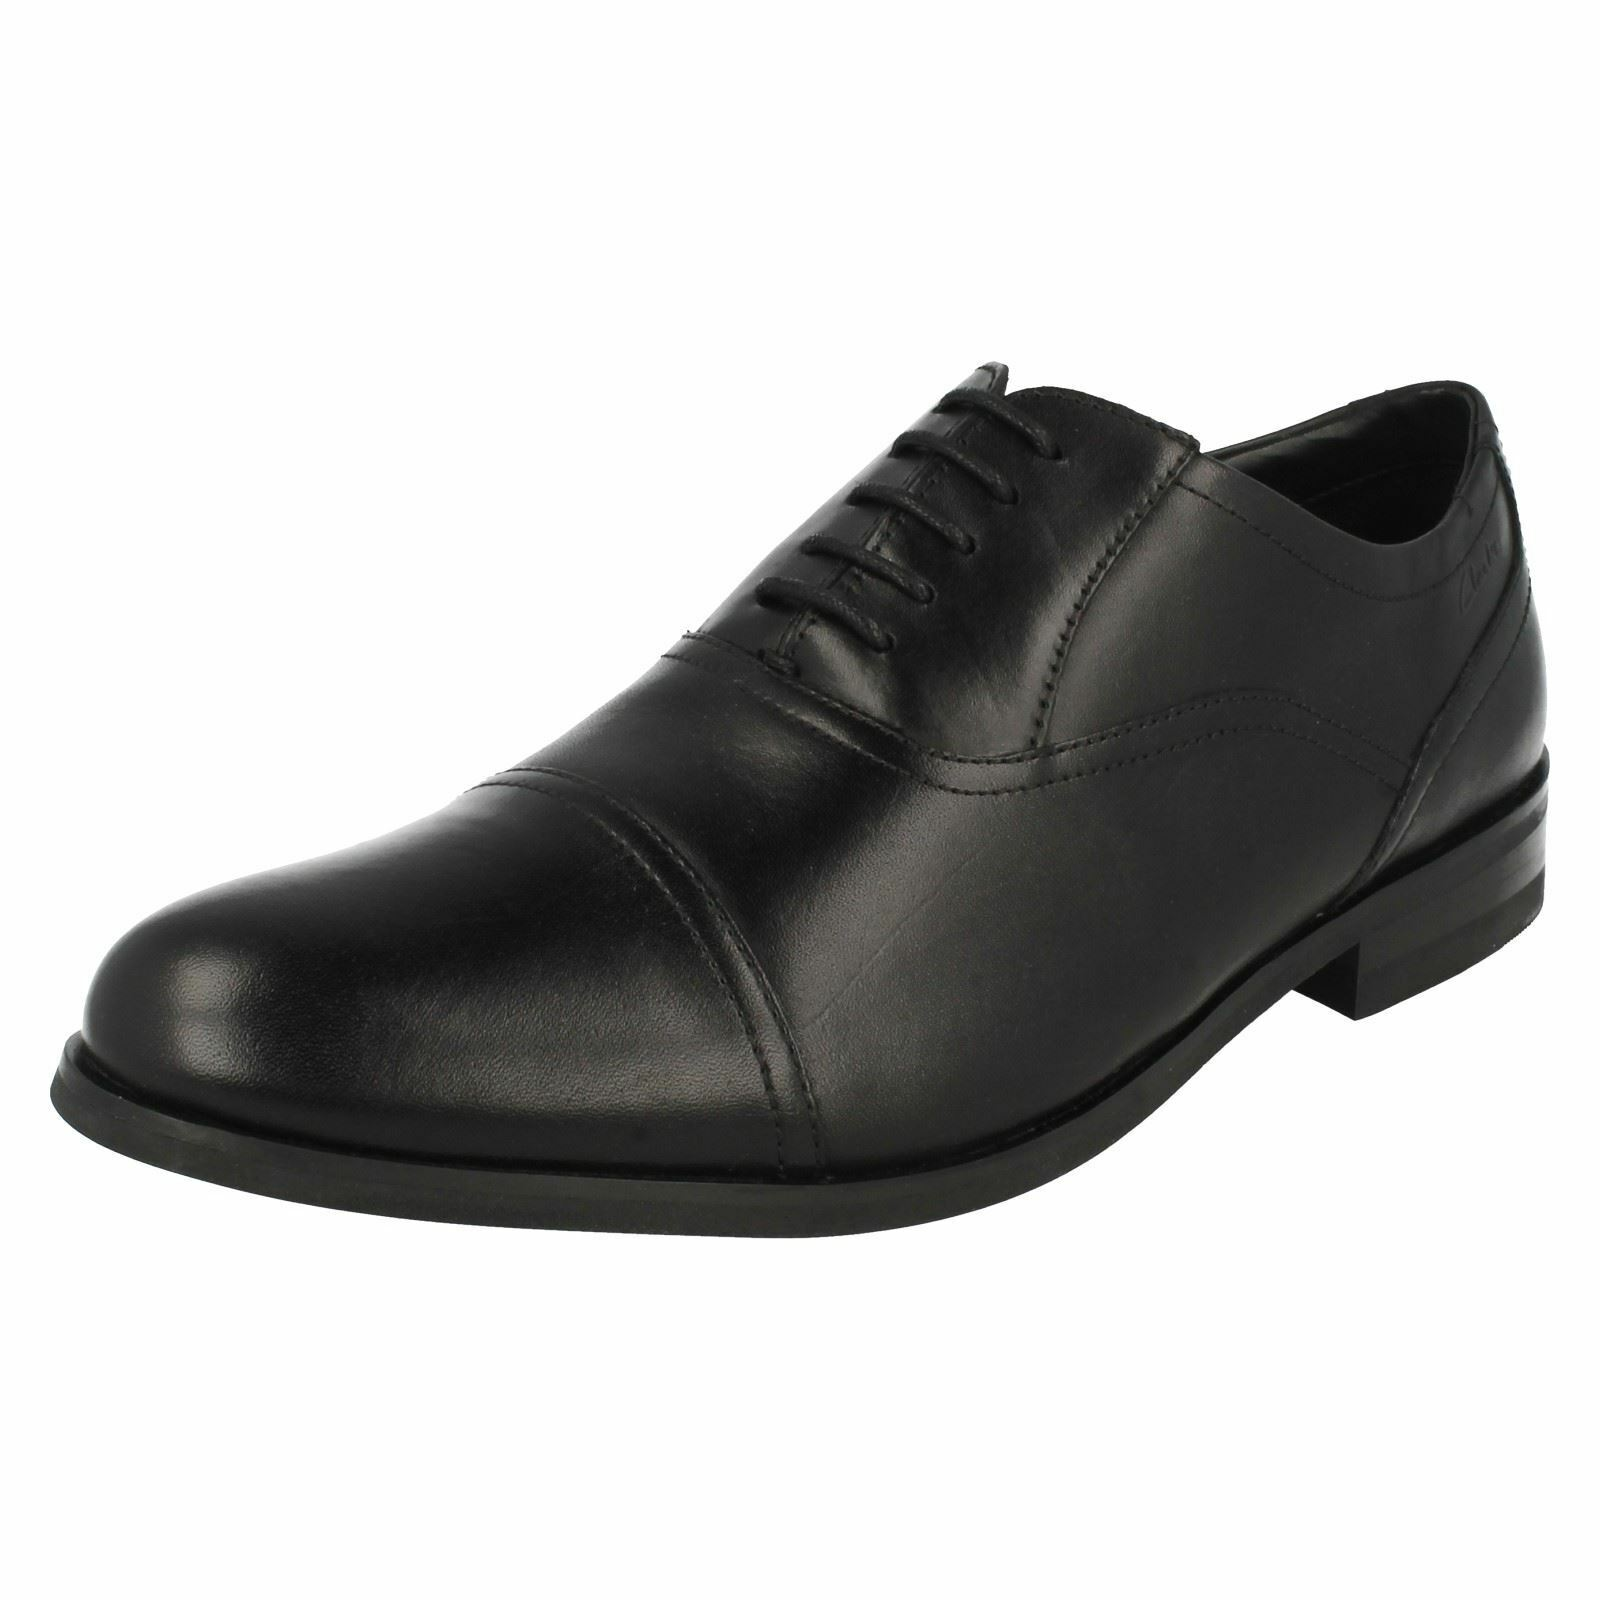 Clarks Mens Formal Lace Up Shoes Brint Cap